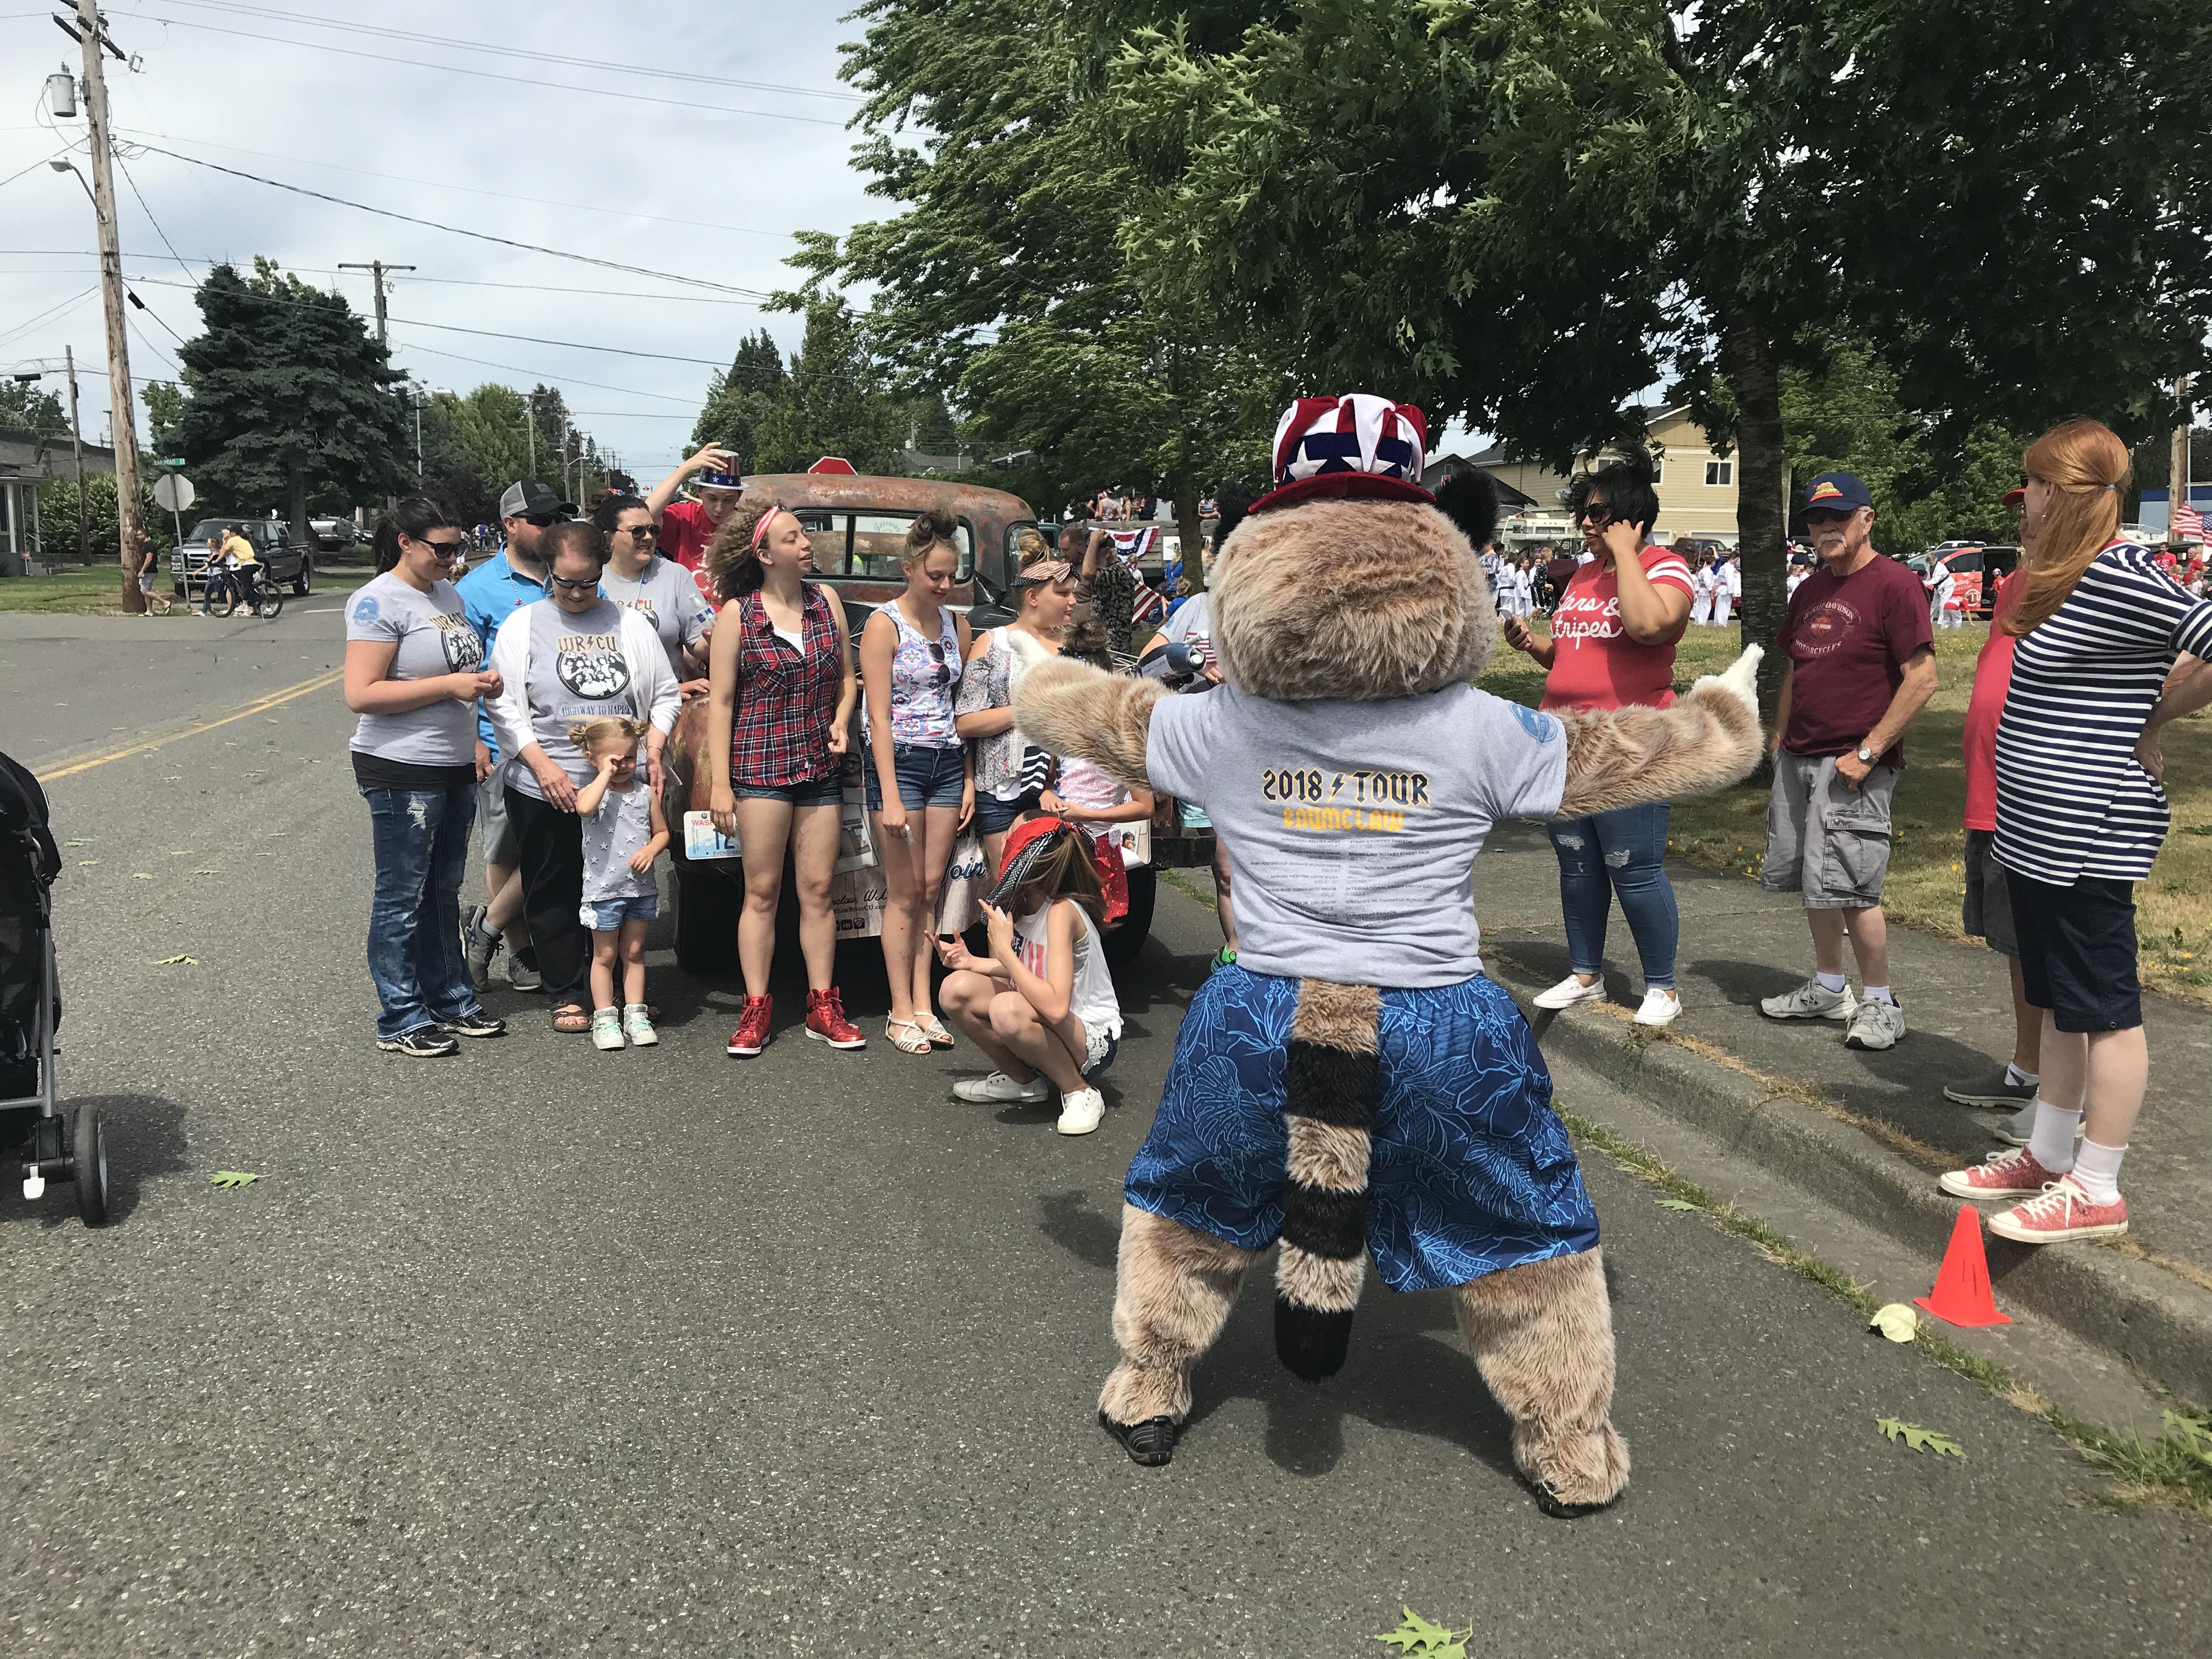 Rocky Raccoon standing in front of kids